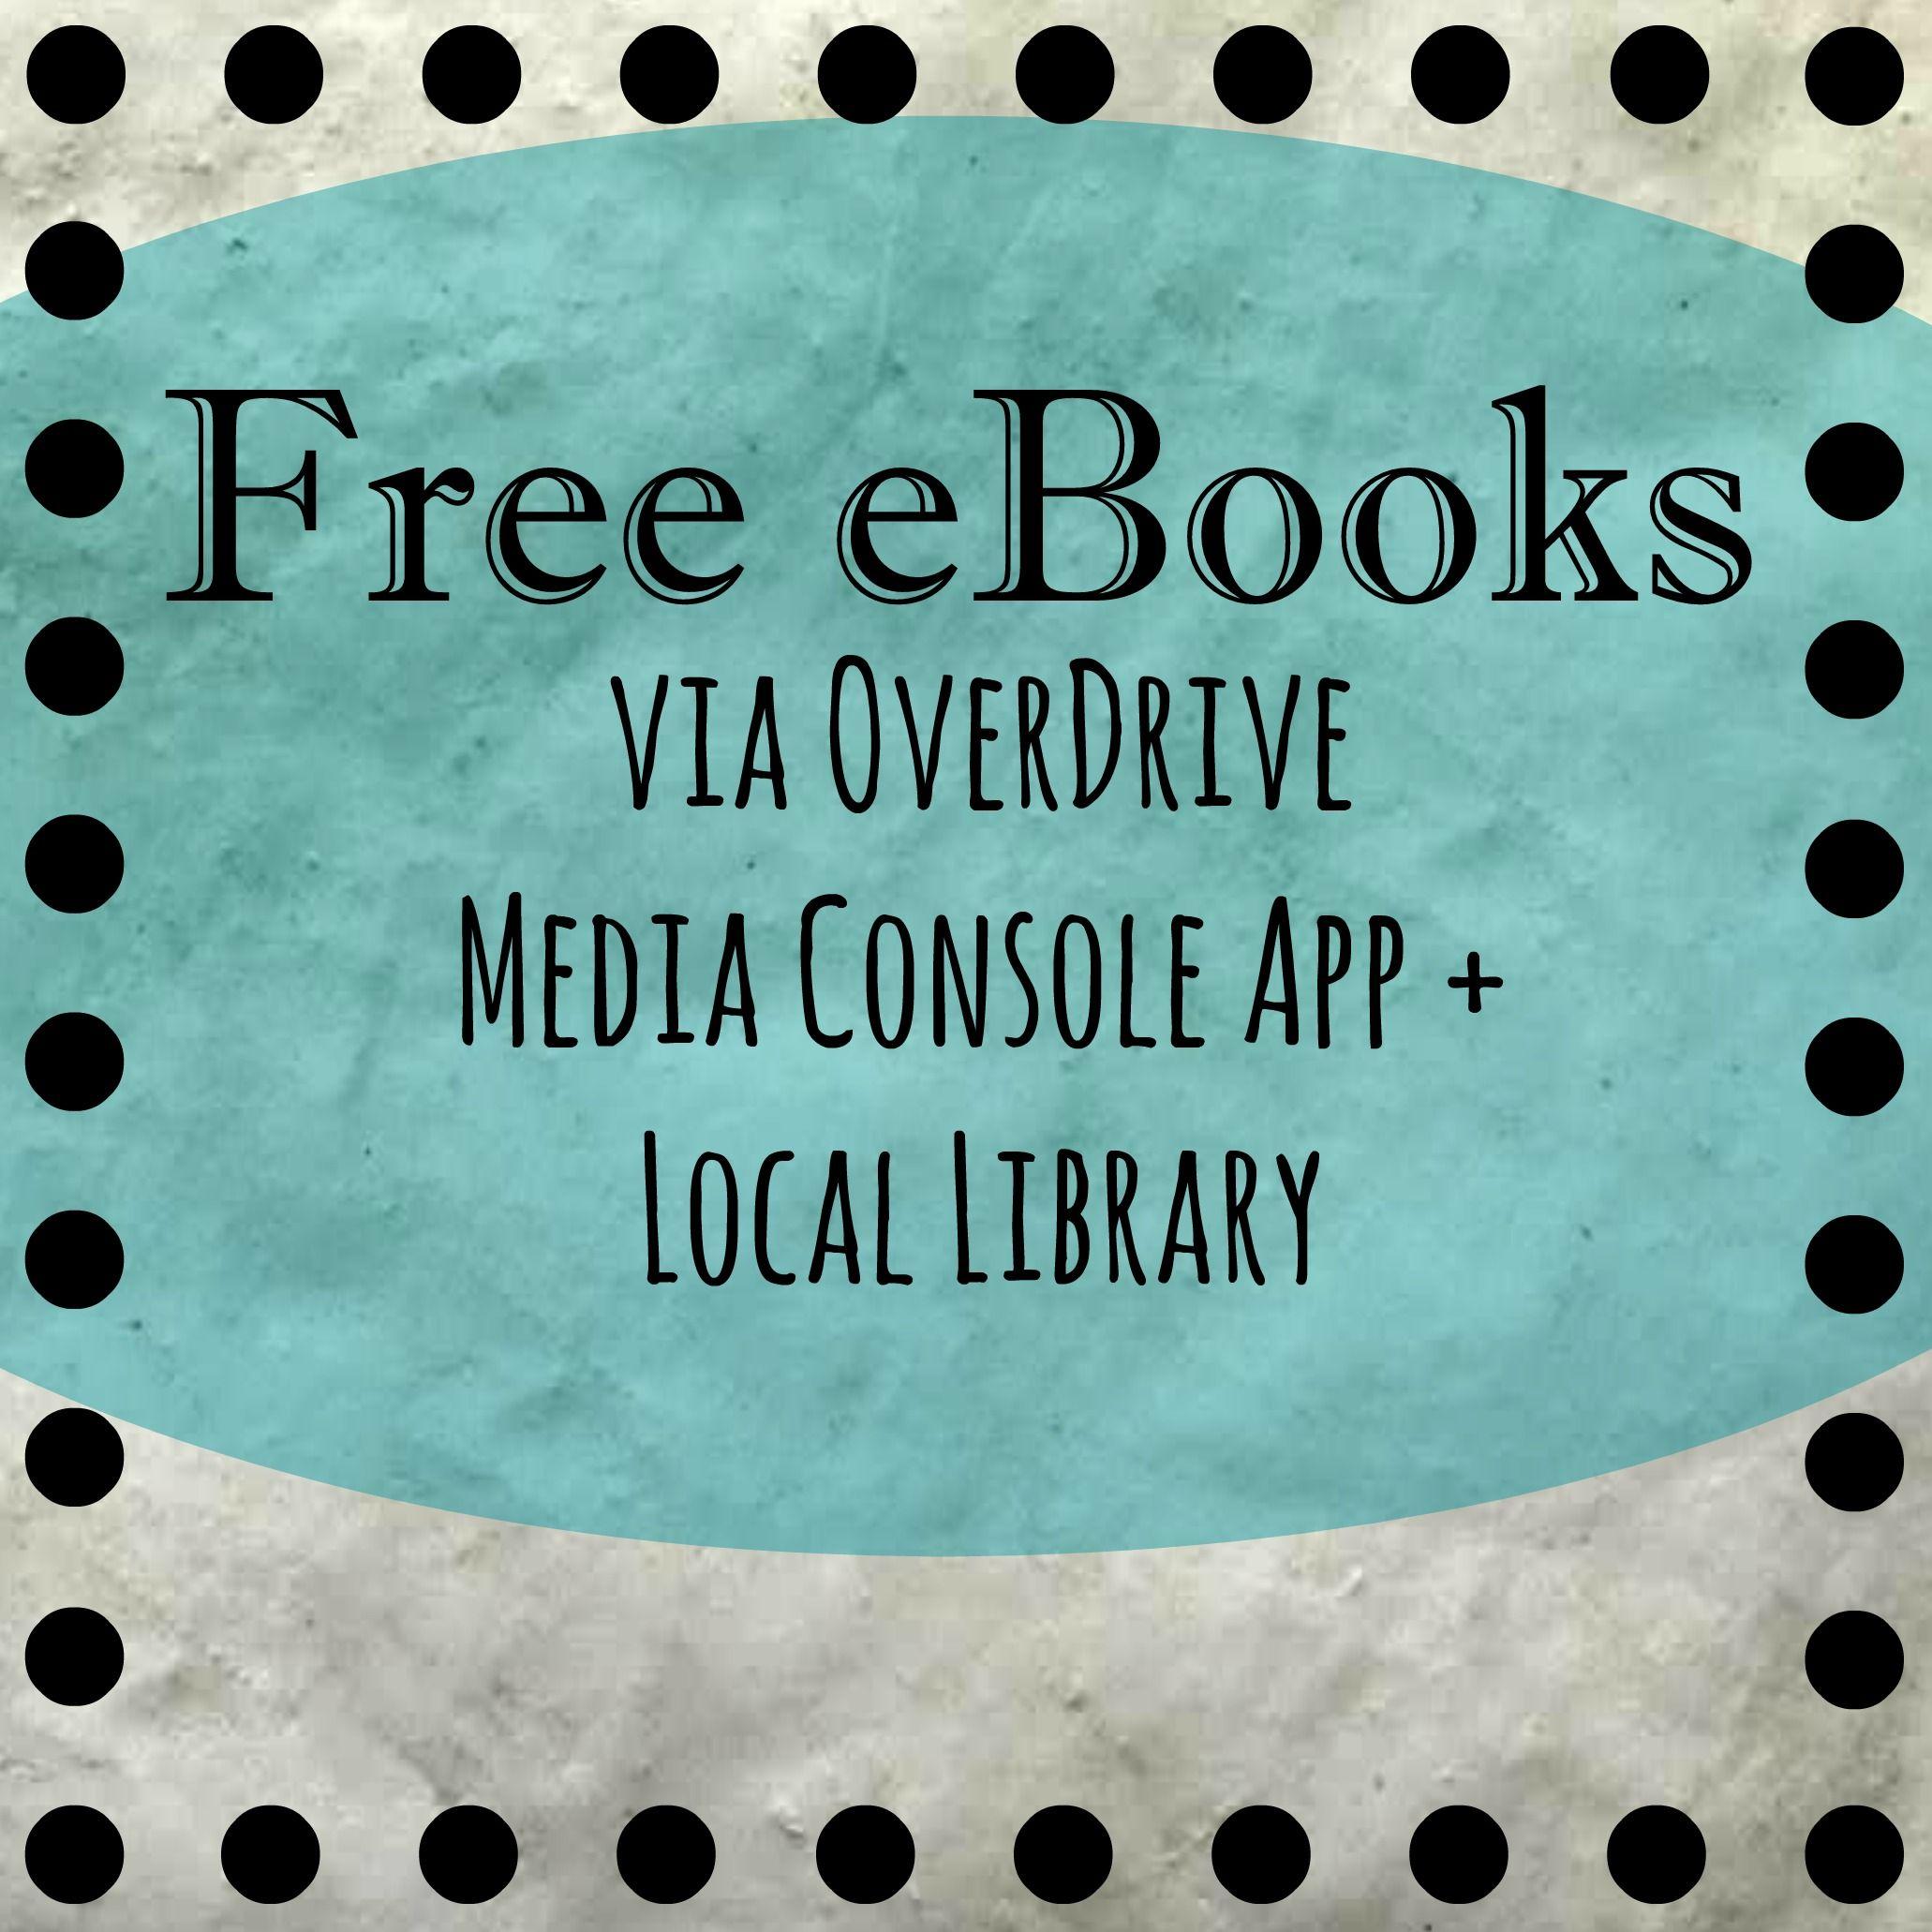 Overdrive app for free ebooks Free ebooks, Ebooks, Media